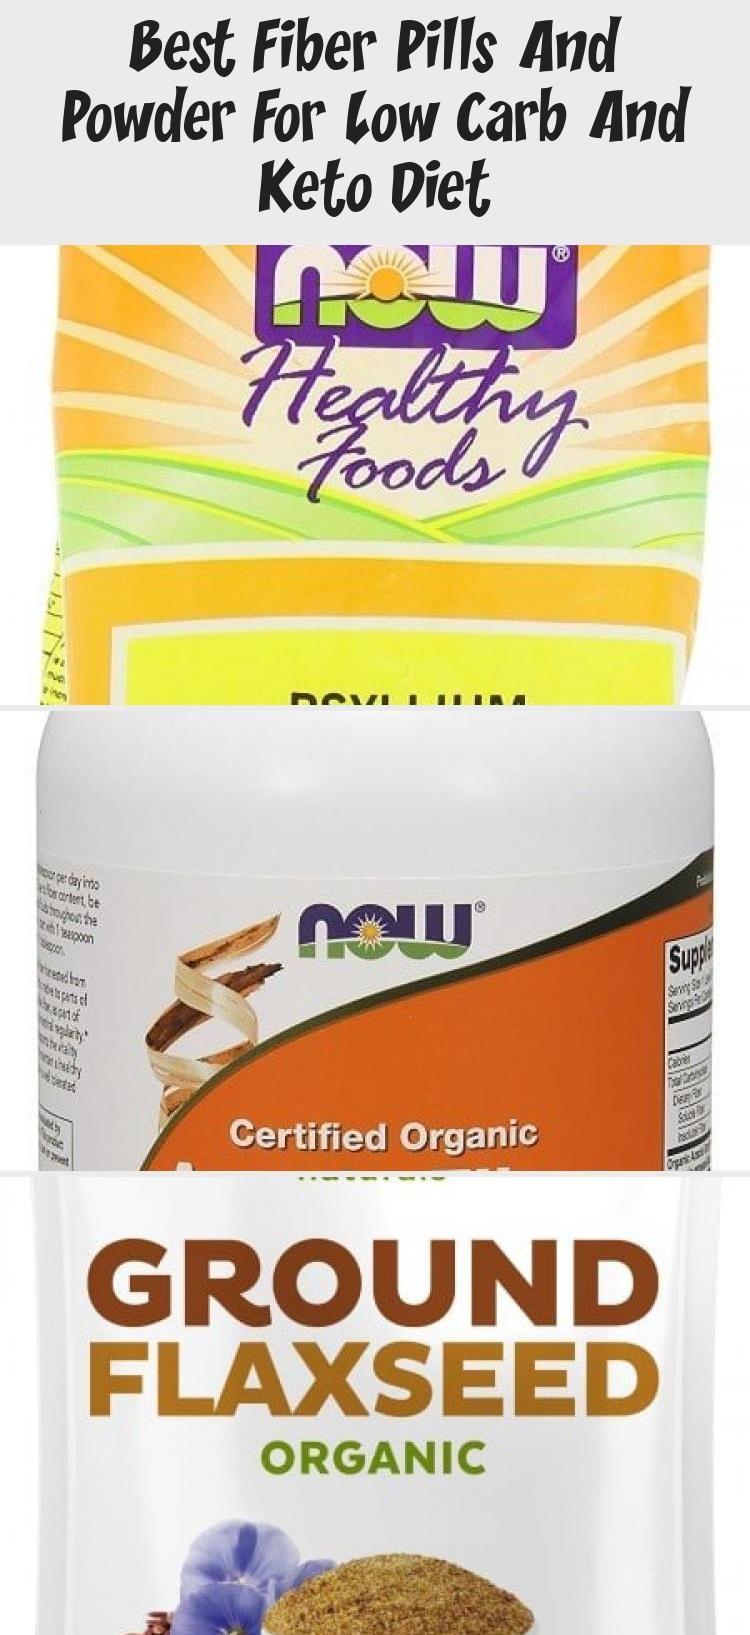 fiber supplements for low carb diet